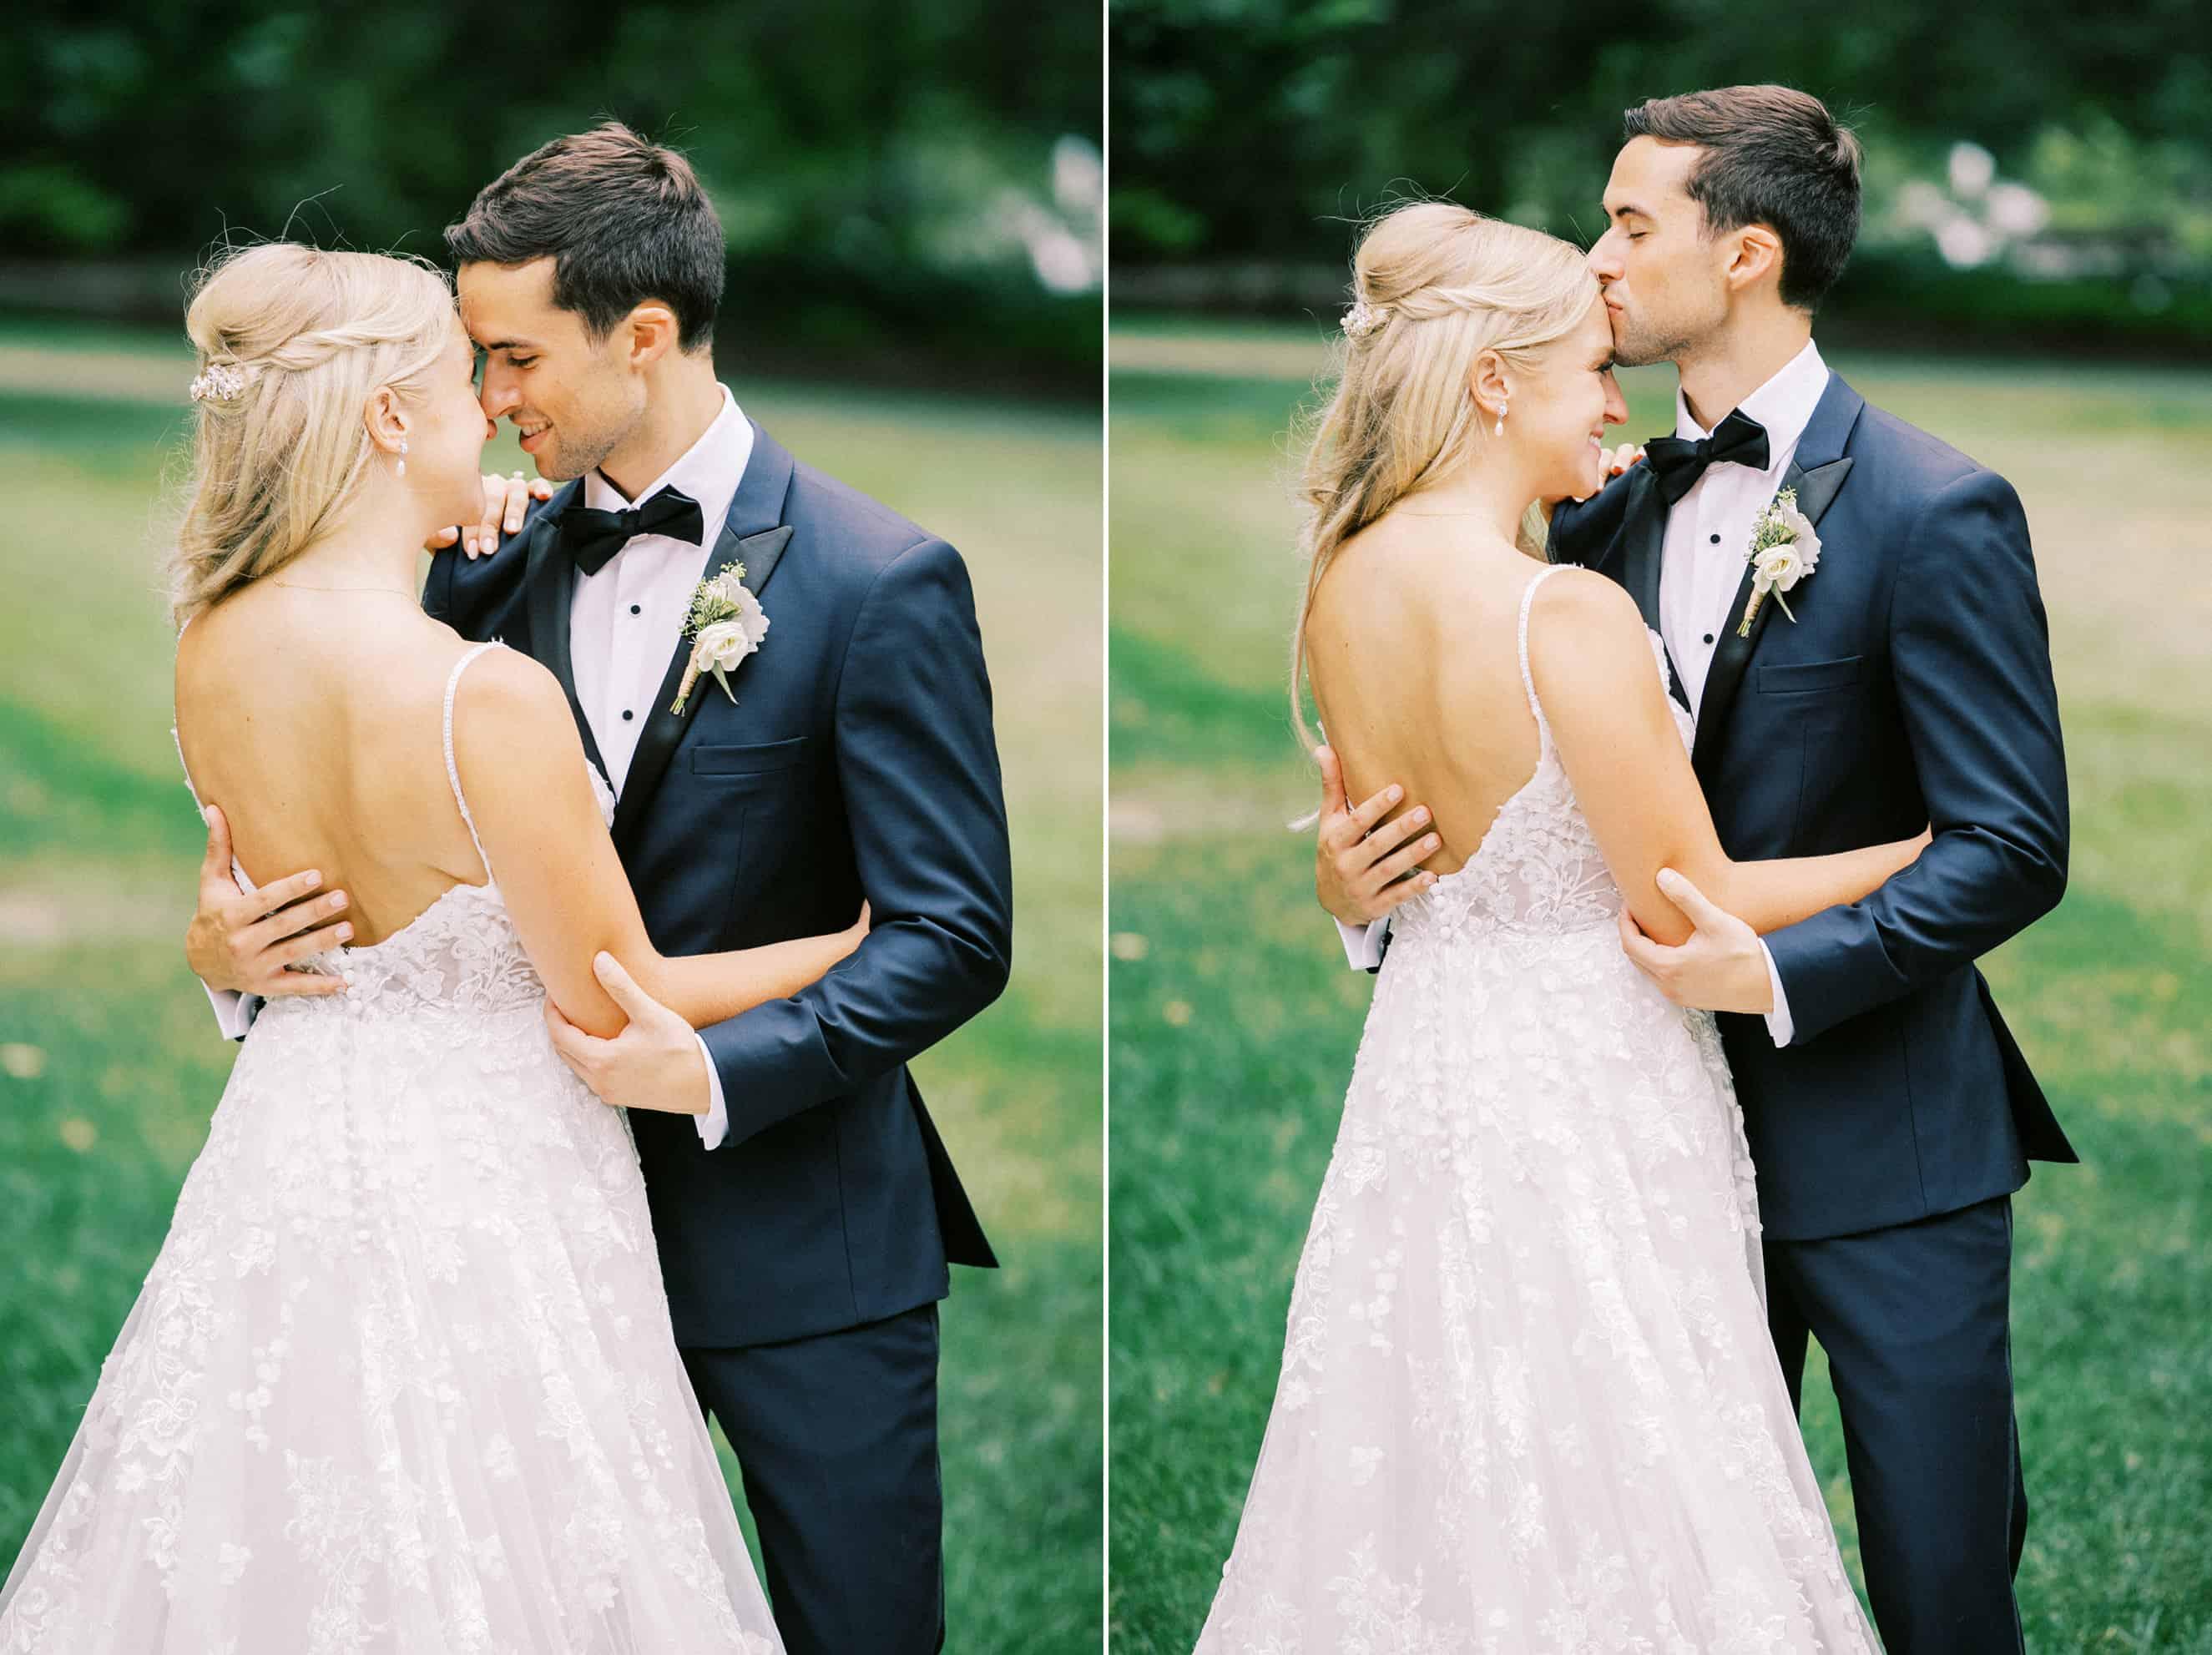 Villanova Pictures of Weddings